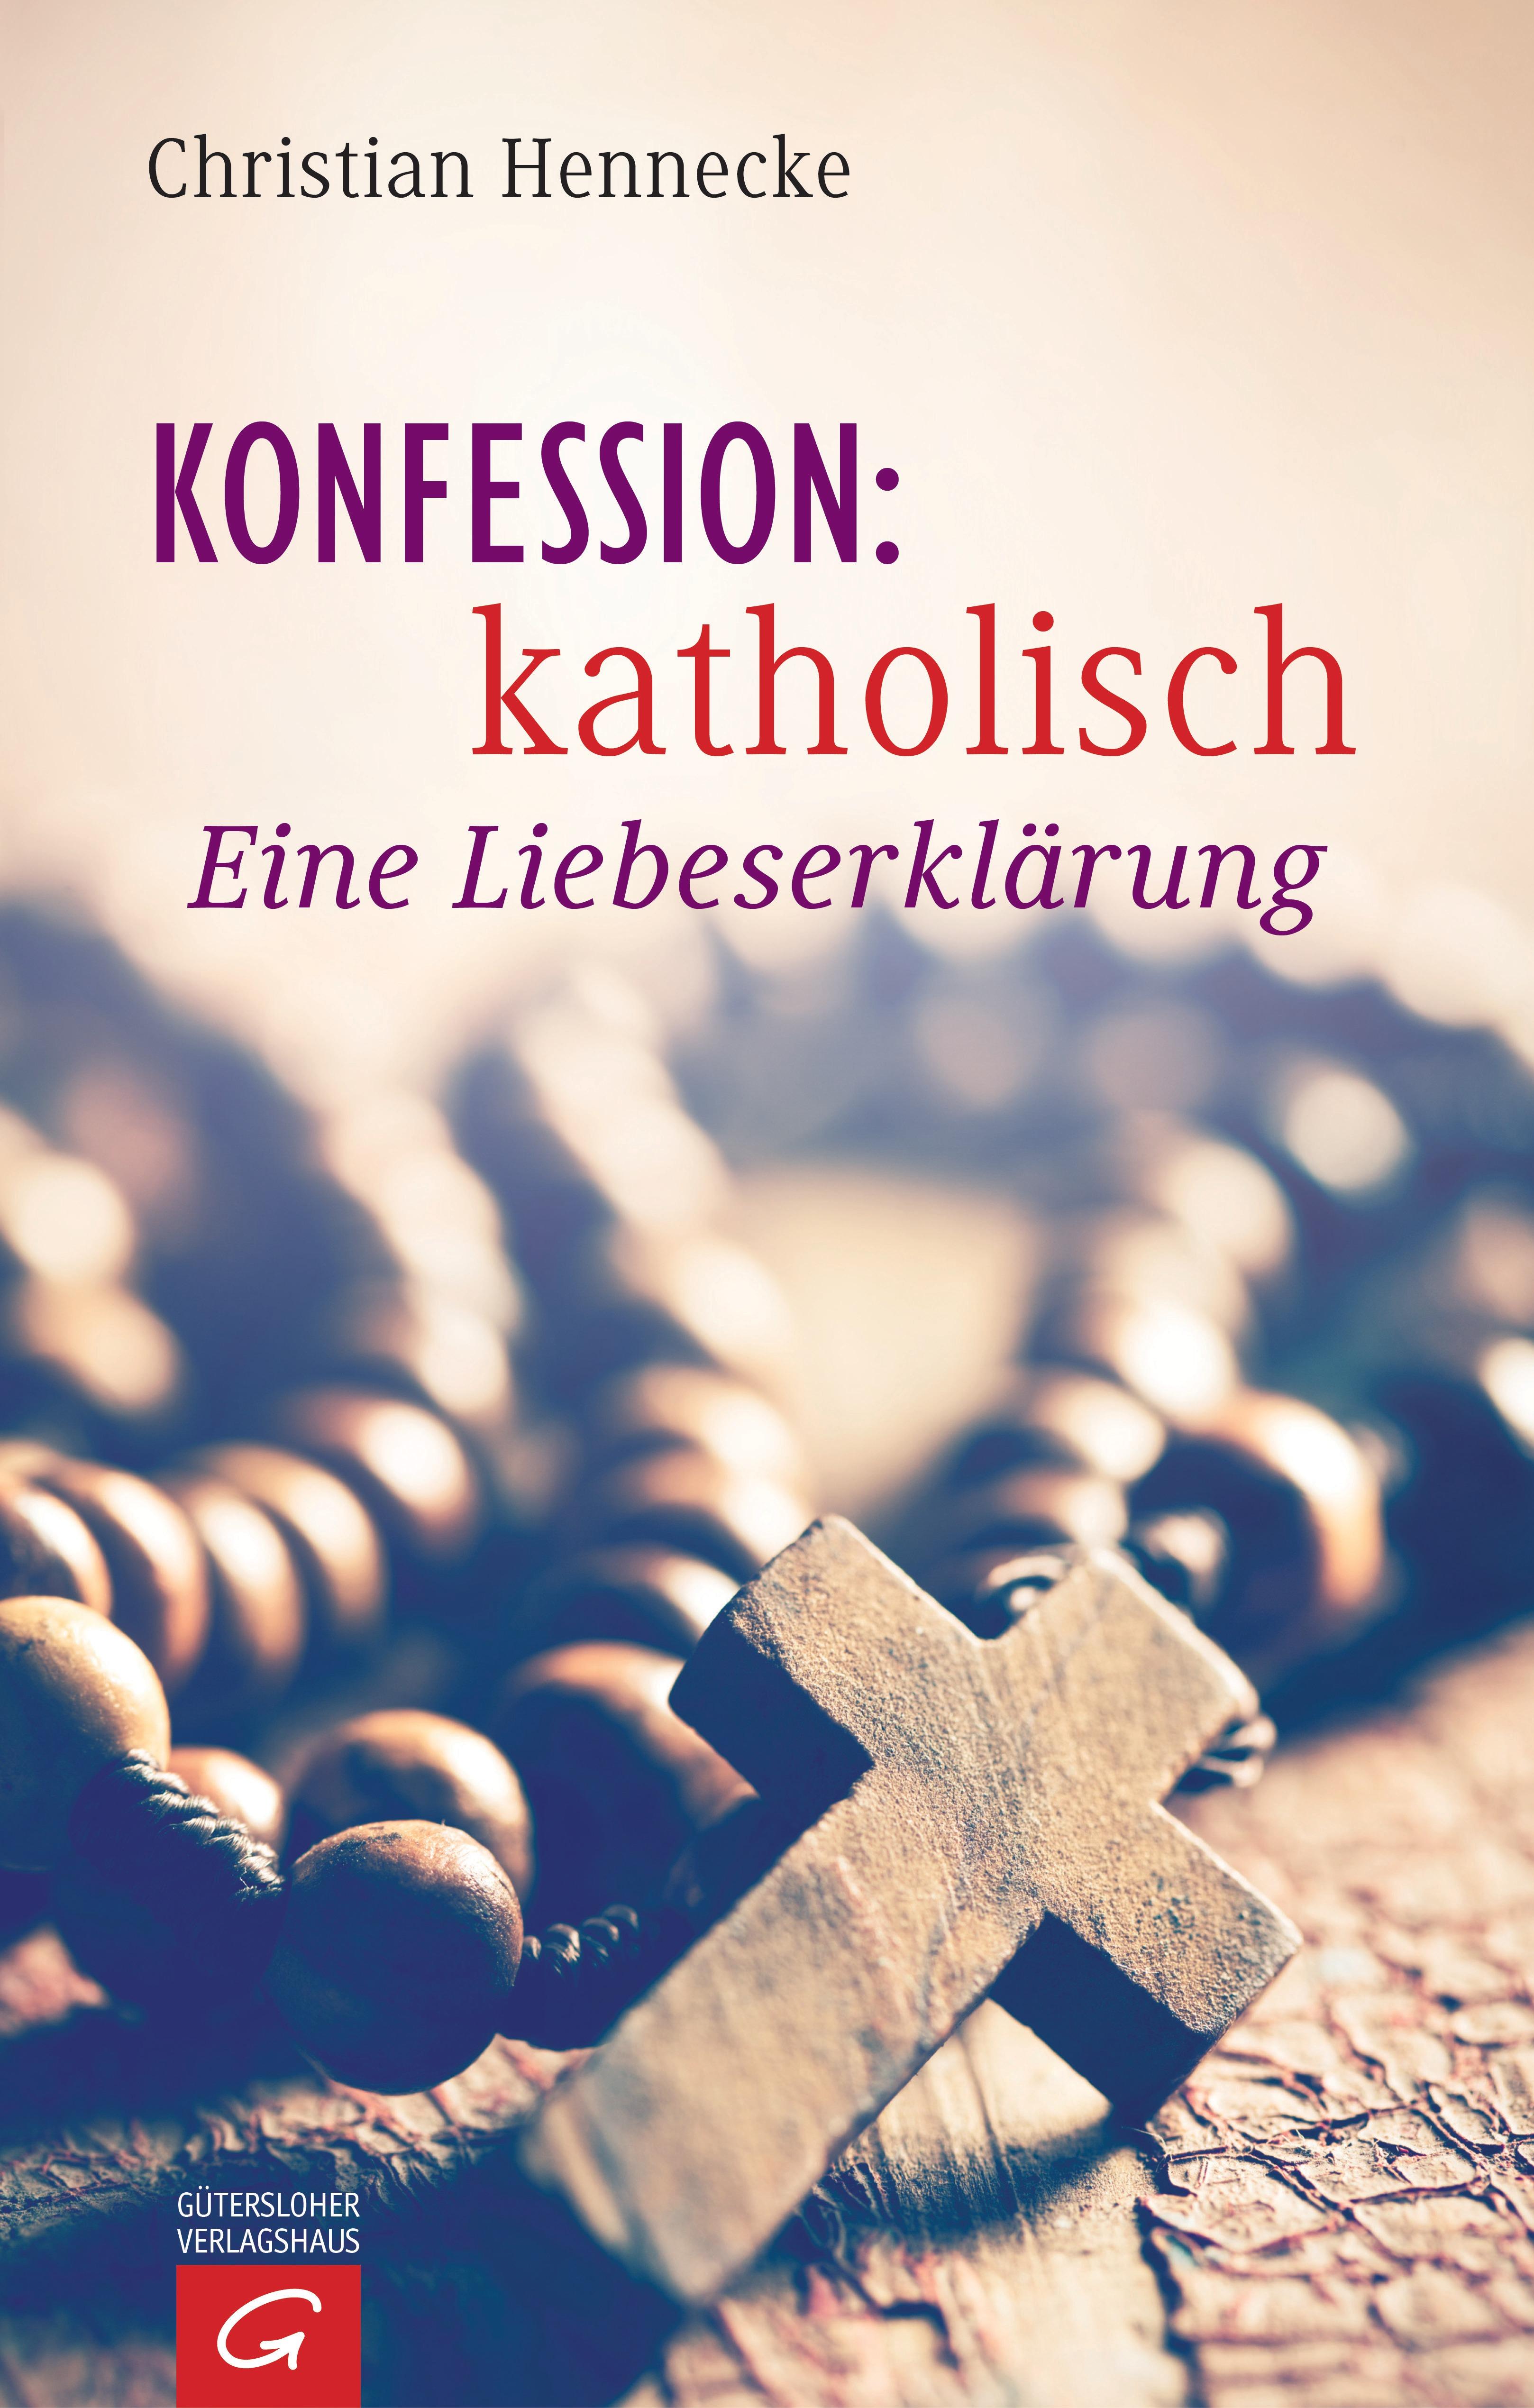 Christian Hennecke Konfession: katholisch